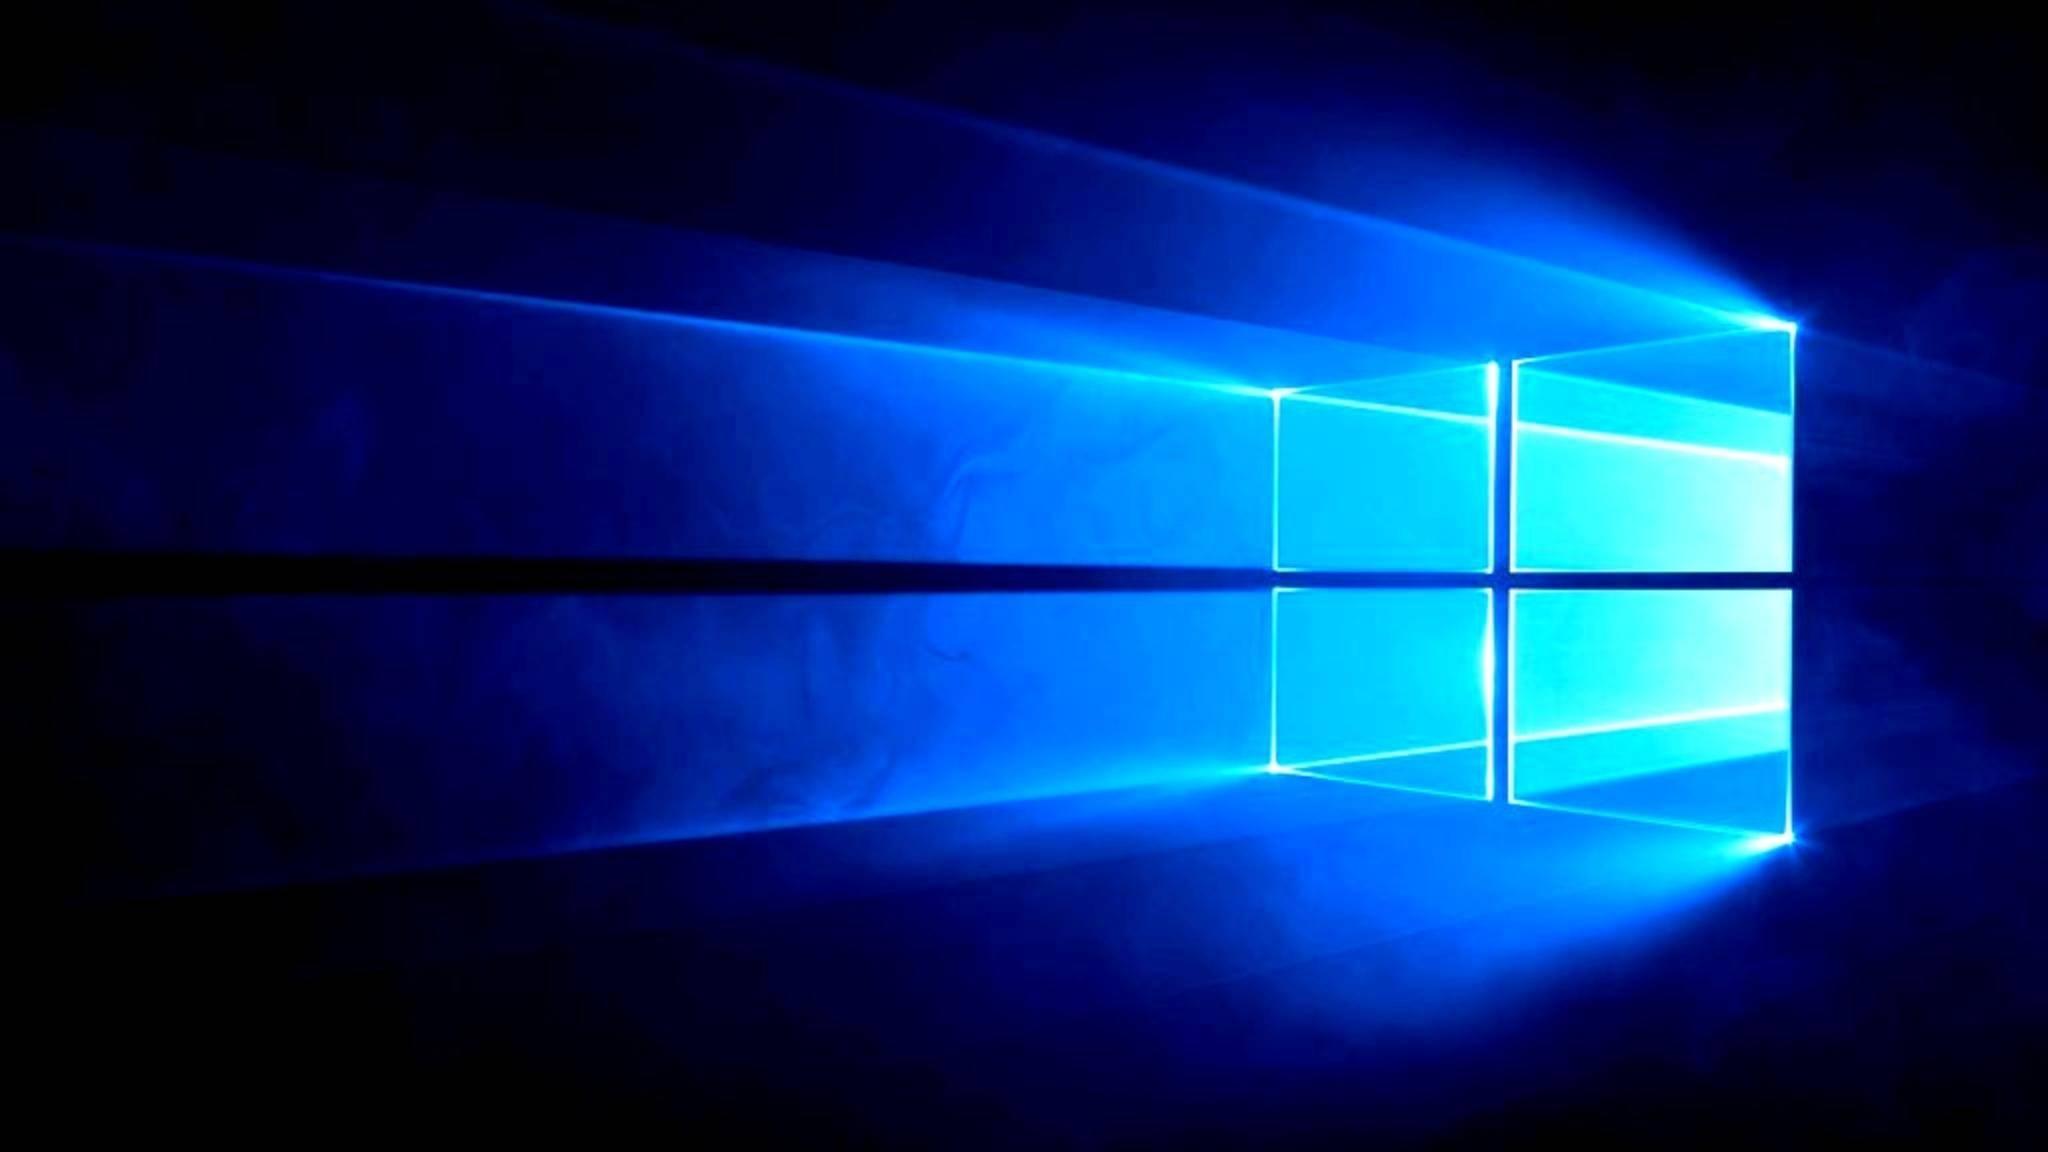 Windows-10-Wallpaper-Desktop